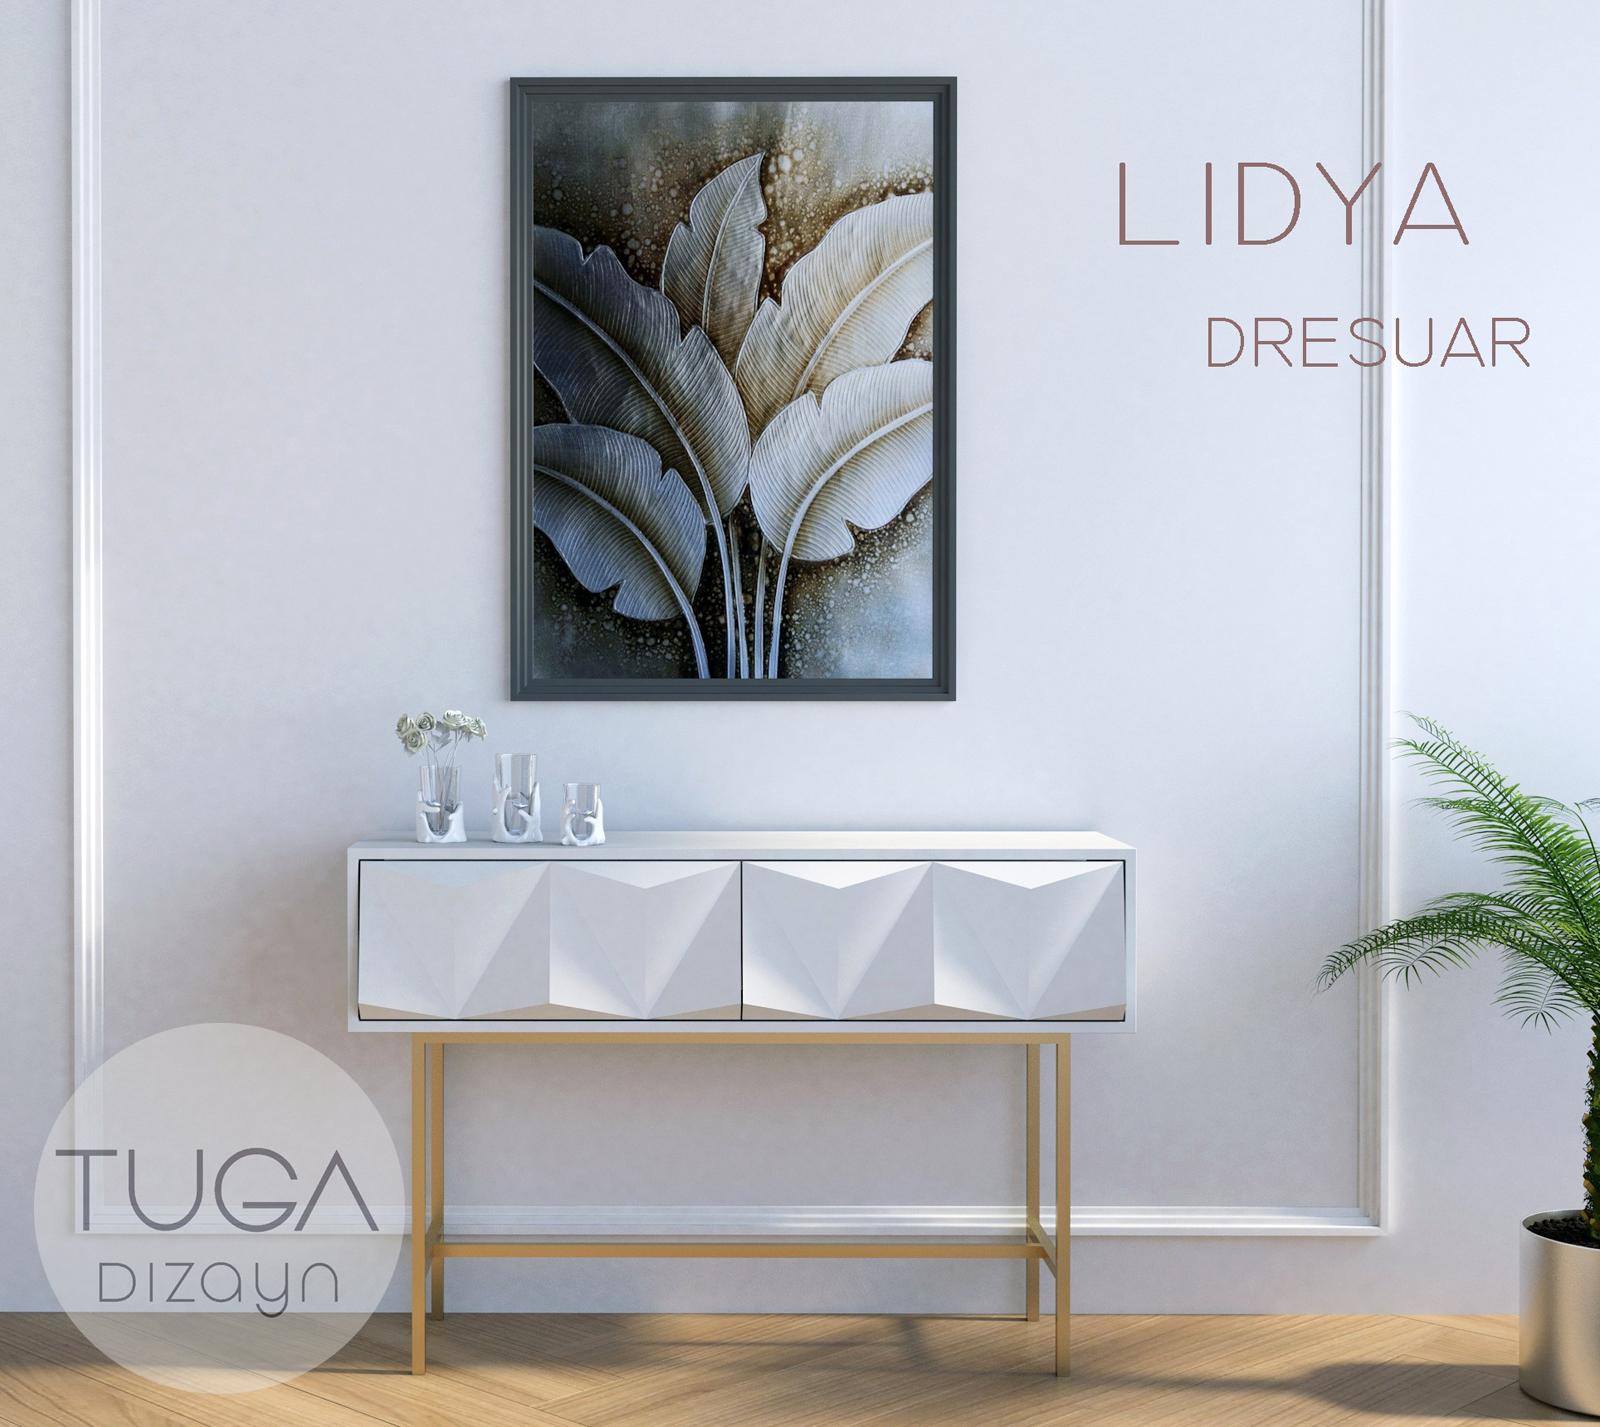 Lidya Dresuar